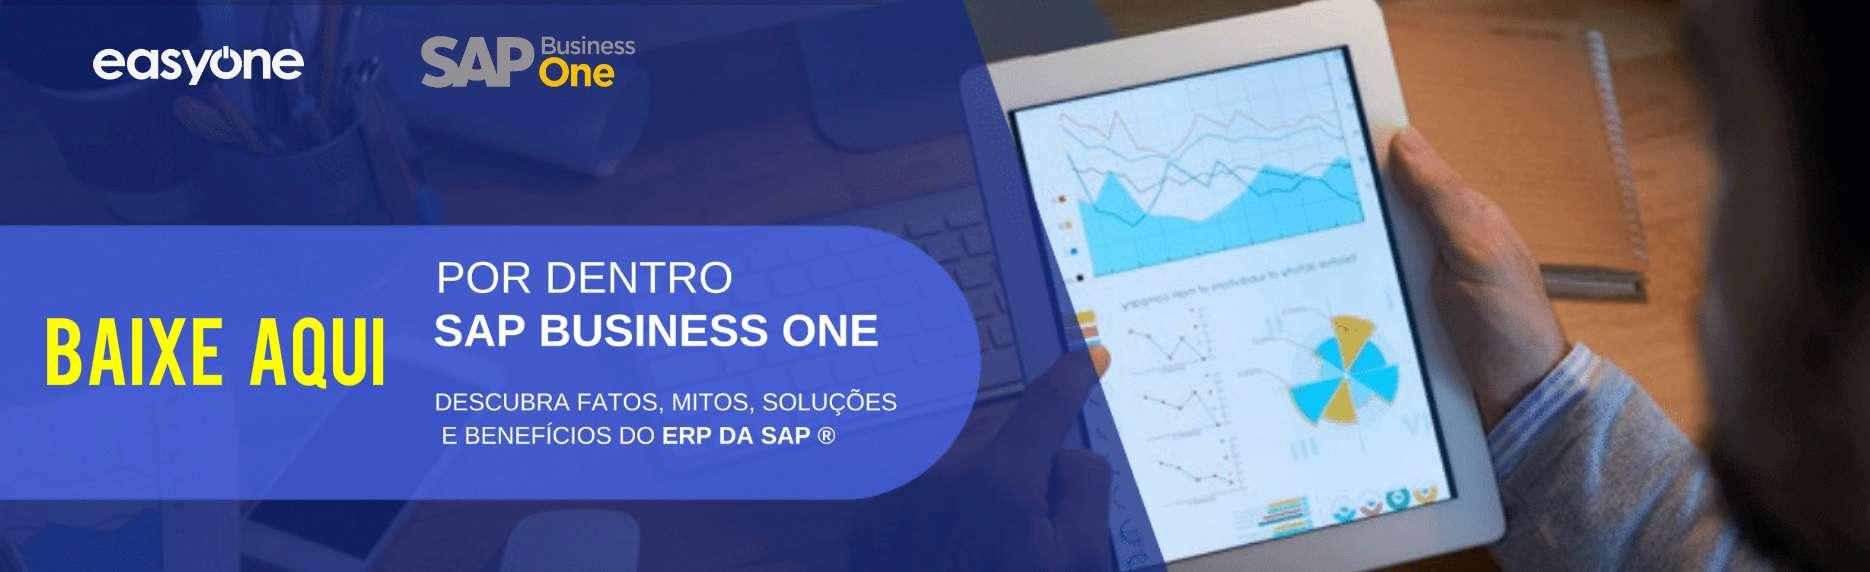 Indústria química - consultoria SAP - ebook sobre SAP